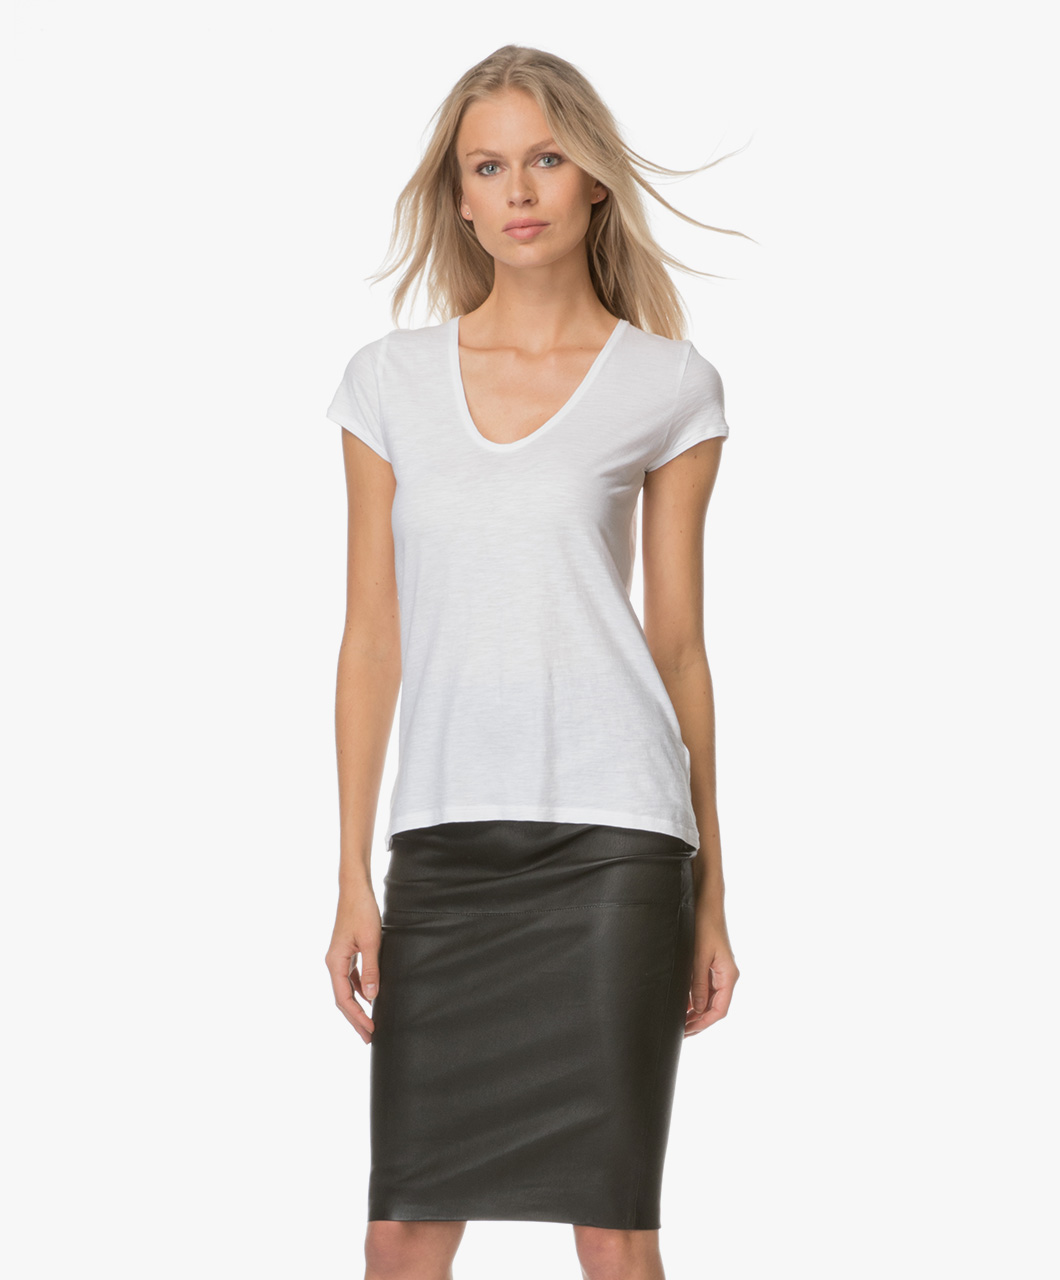 drykorn avivi jersey t shirt white avivi 506100 60. Black Bedroom Furniture Sets. Home Design Ideas